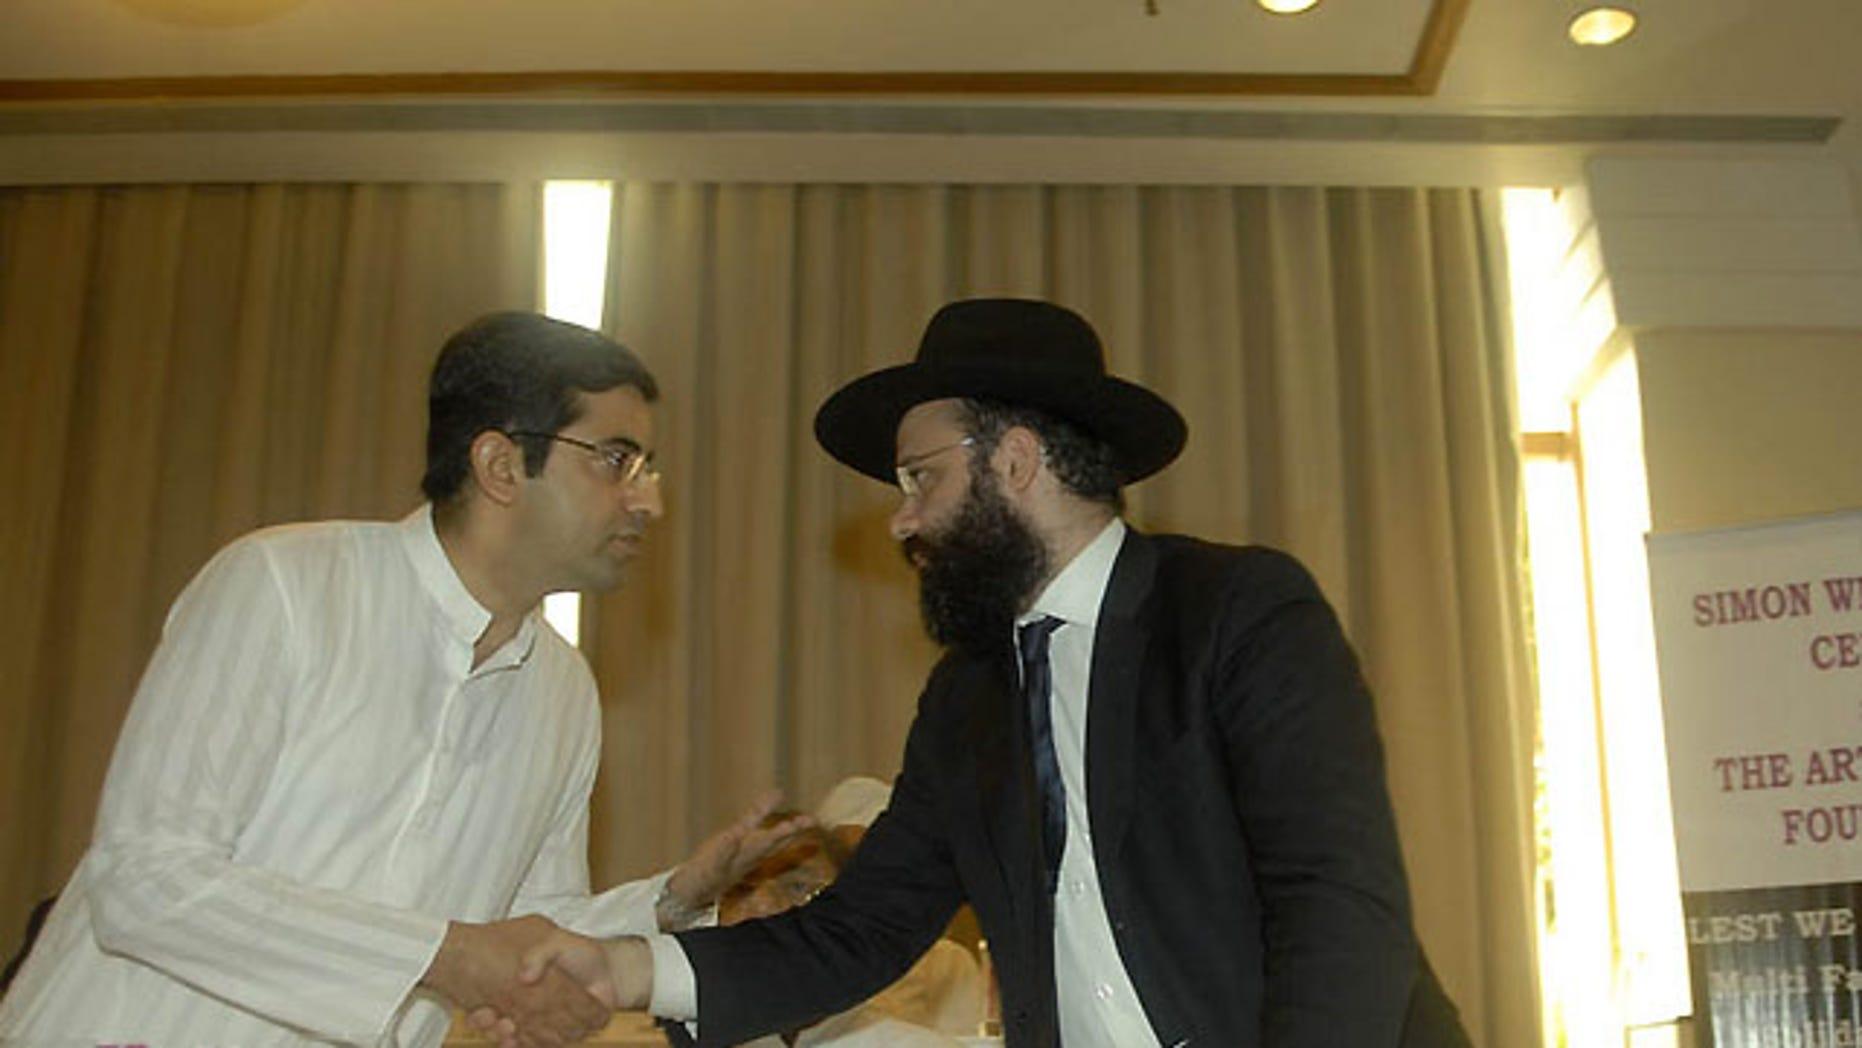 Mr. Rajat Malhotra of the Center For Peace & Spirituality (right) and Rabbi Avraham Berkowitz (left)